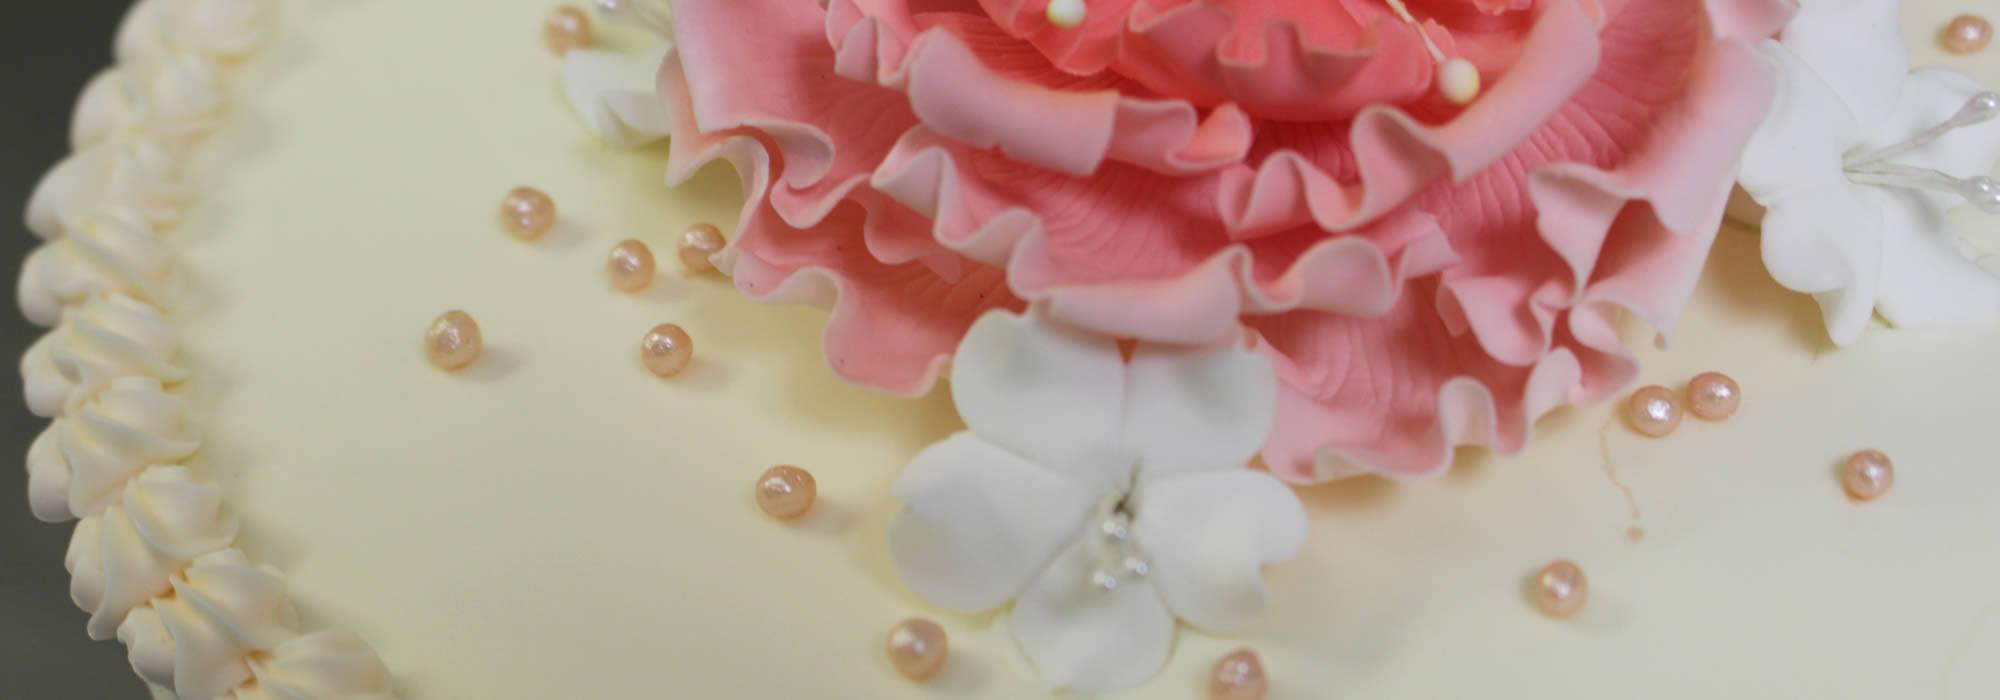 White Cake with Pink Sugar Flower